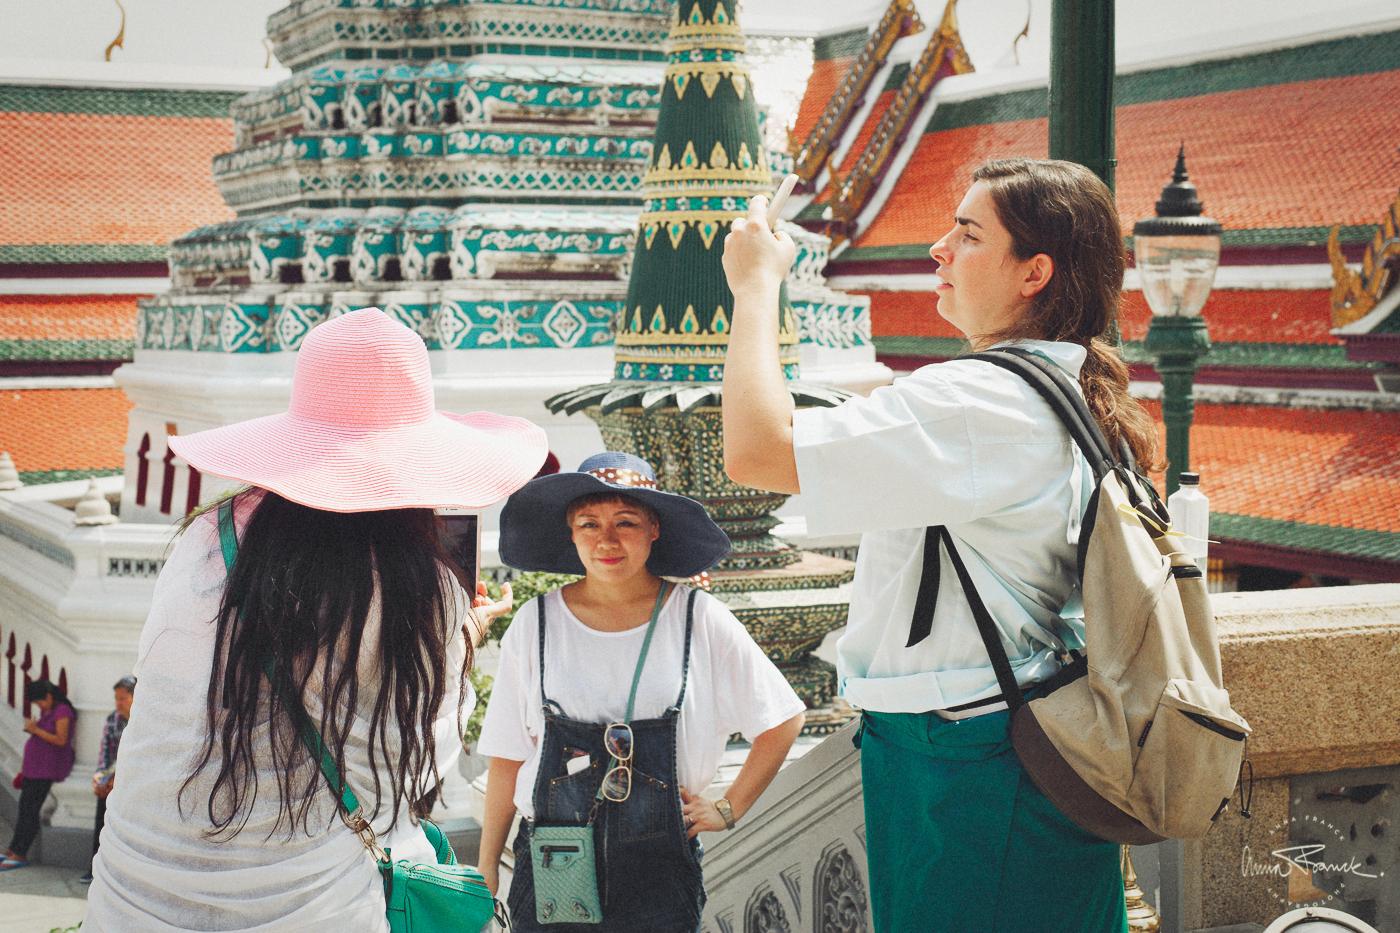 anna, franck, photography, thailand, streetphotography, faces, people, humans, manniskor, ansikten, möten, snapshot, gatufotografi